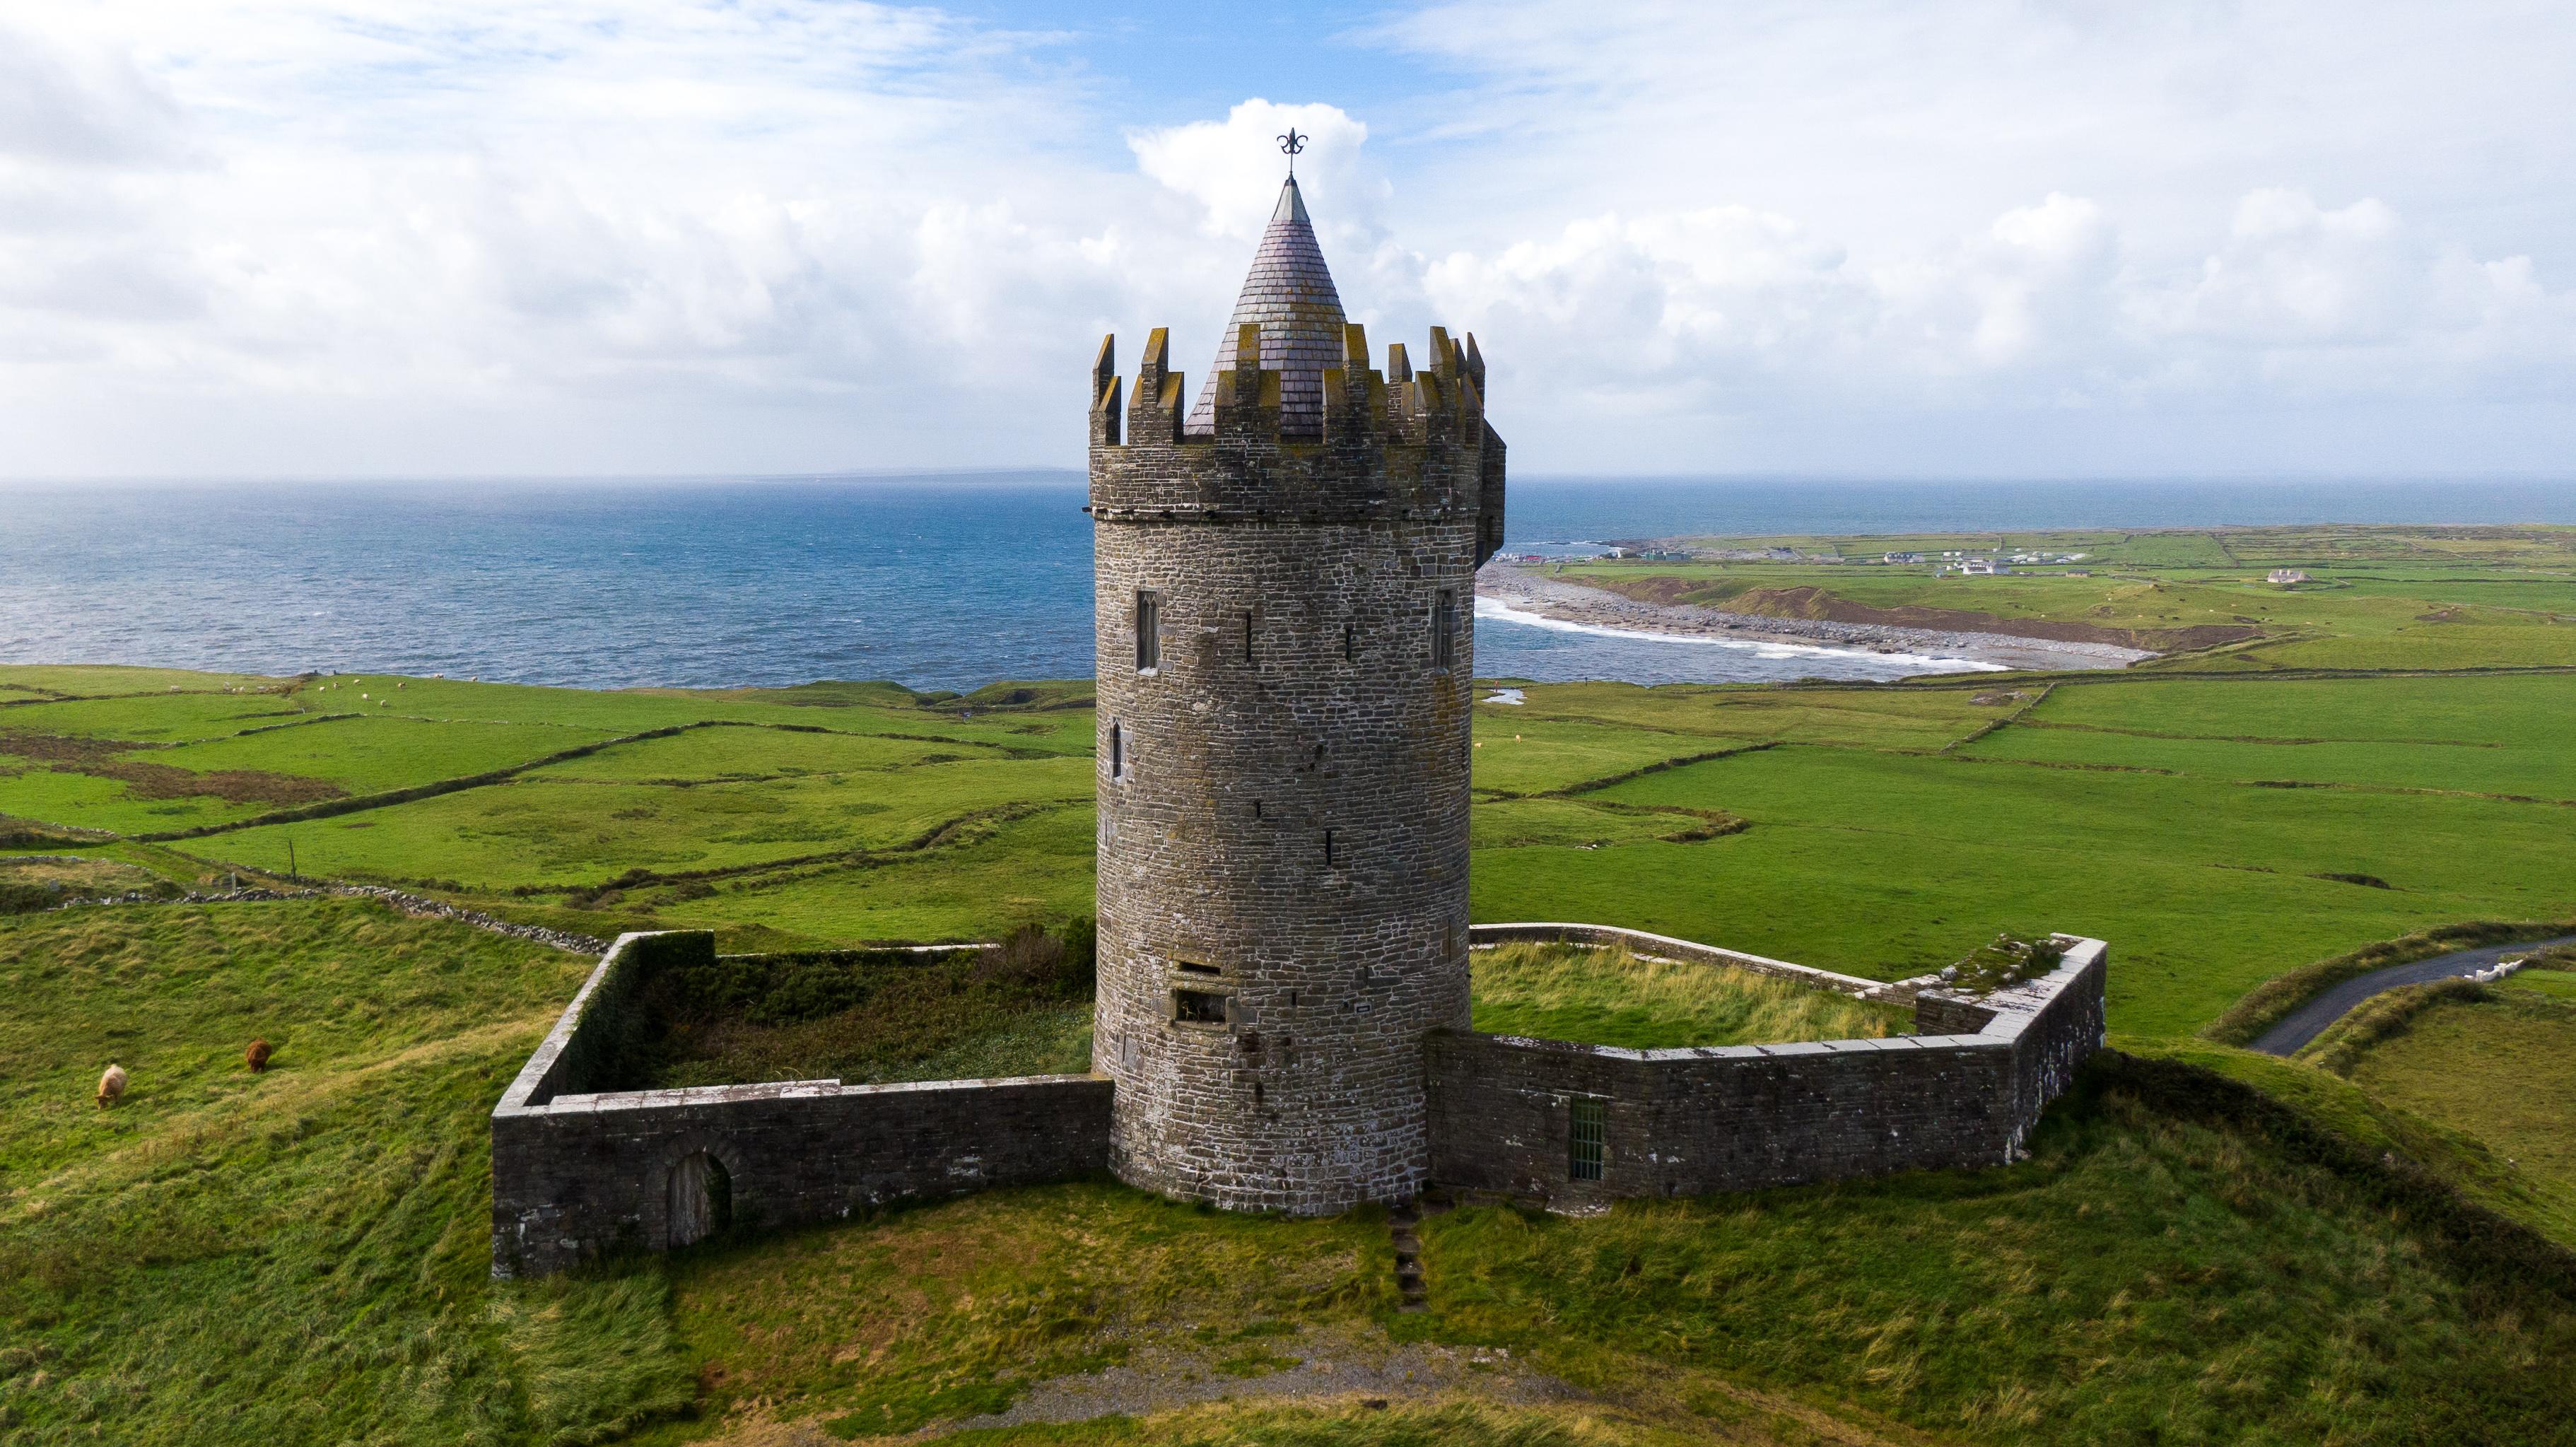 Vivi la magia dell'Irlanda